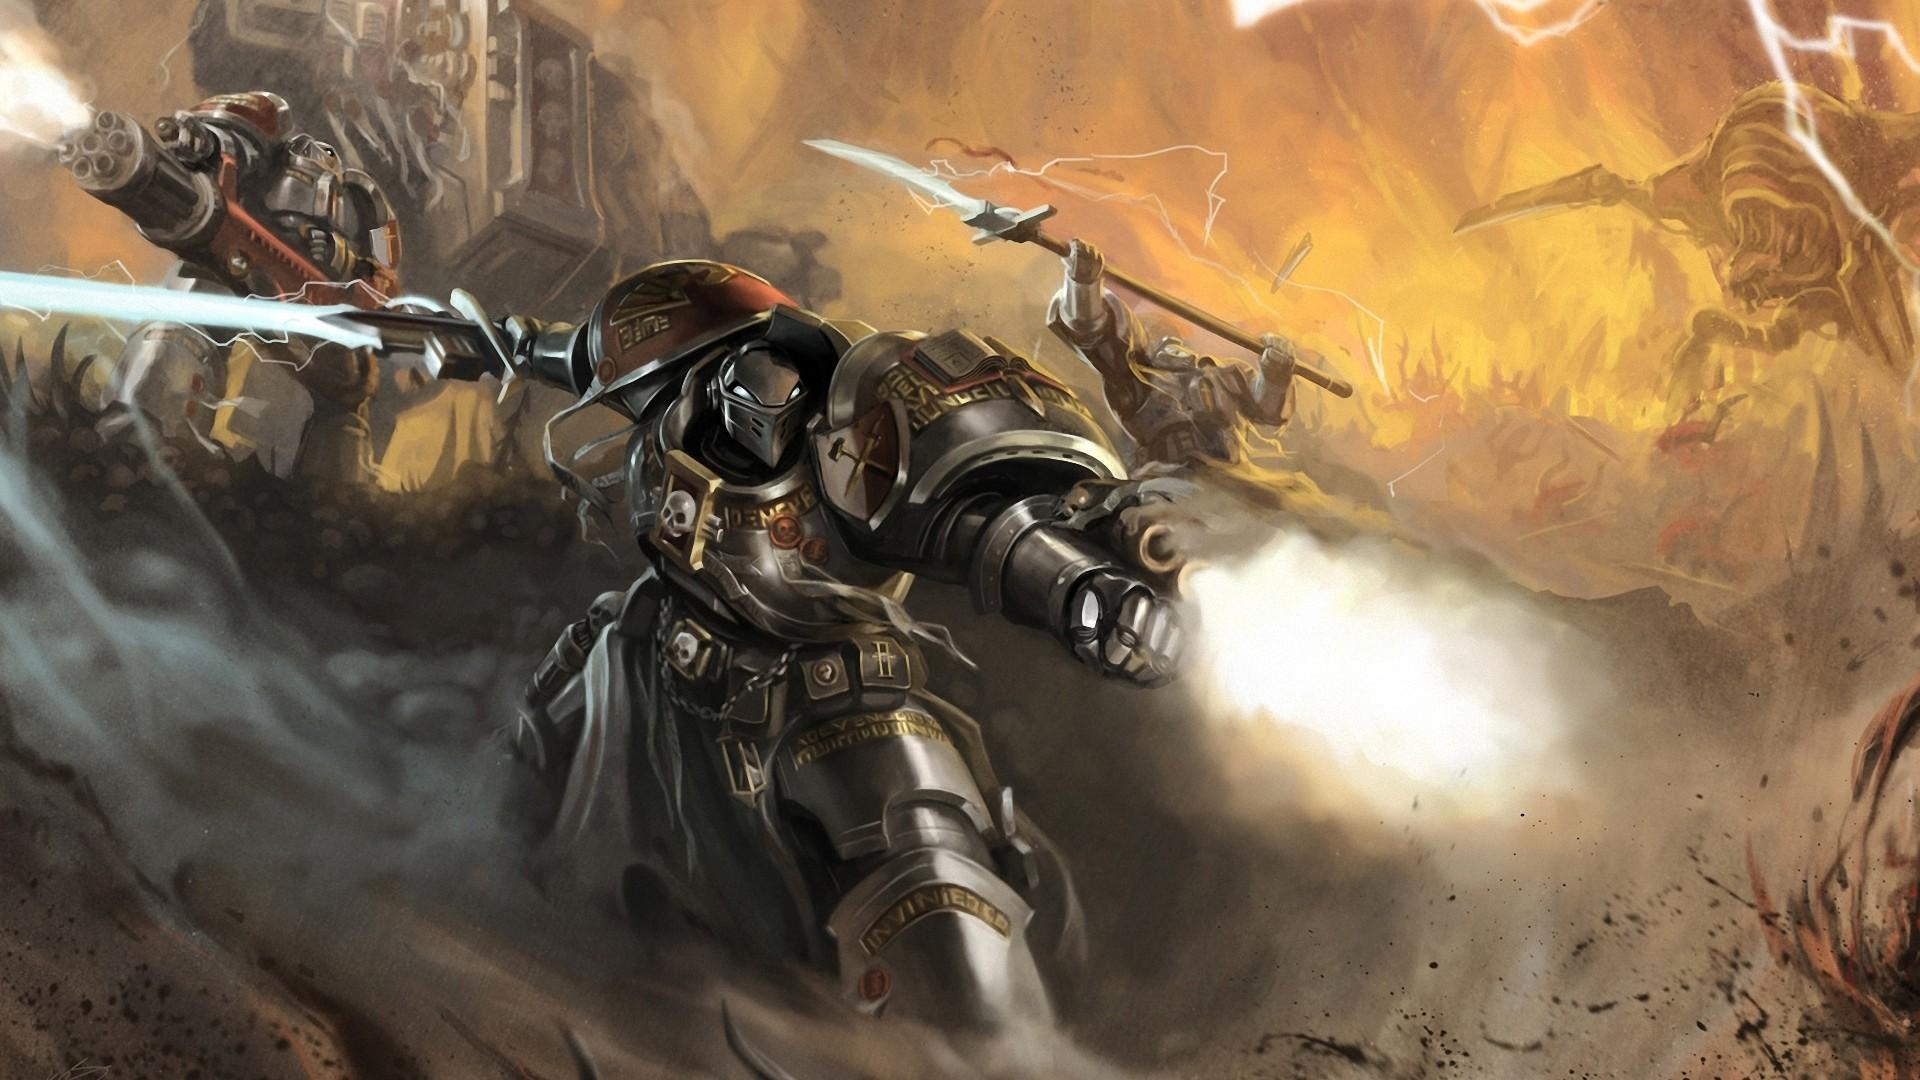 Wallpaper okita, warhammer 40k, space marines, robot, weapon,  sword,